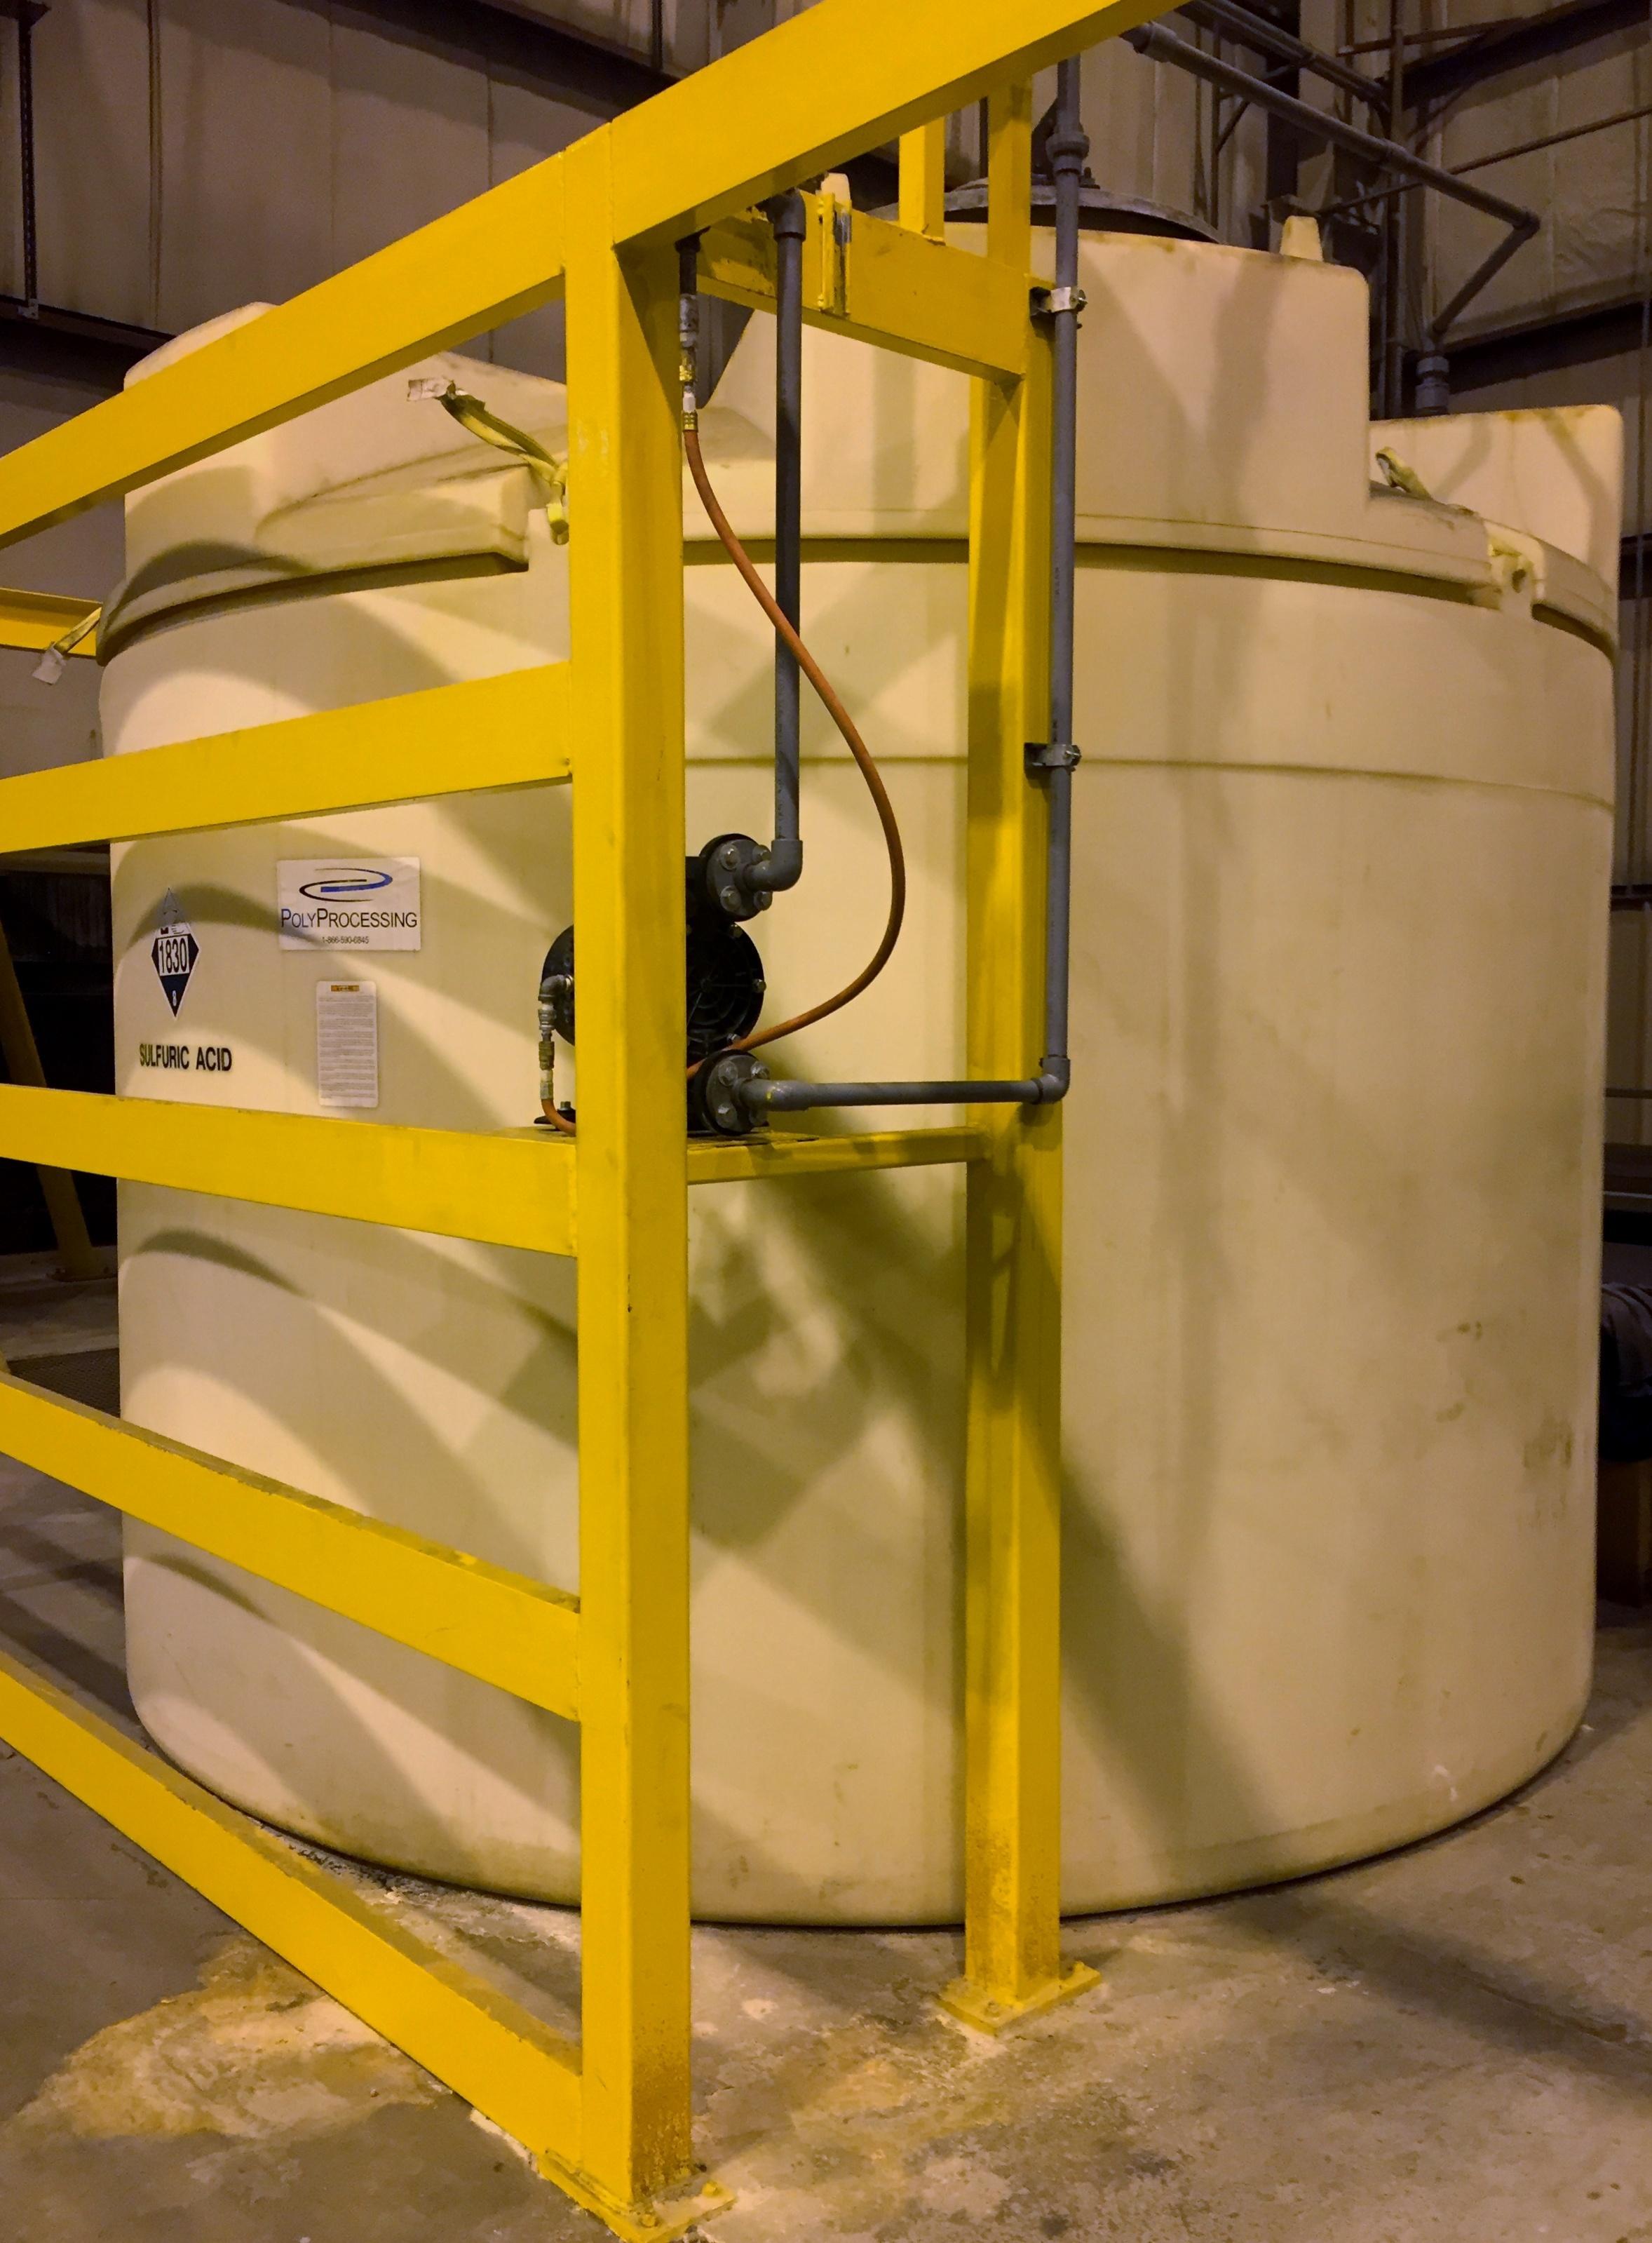 1000 Safe Tank with Pump Shelf (1).jpg